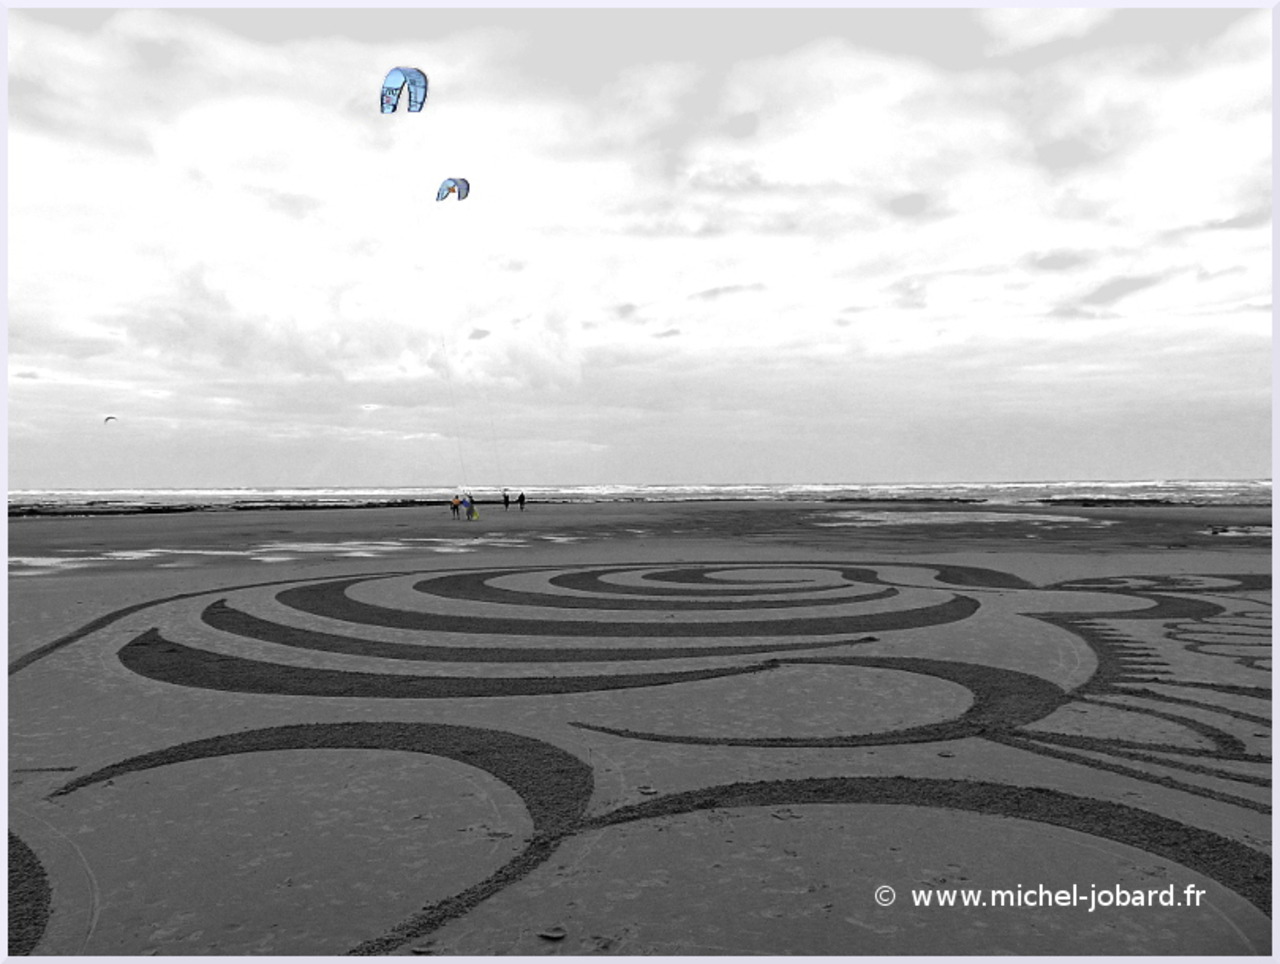 beach-art-In-the-wind-06.jpg